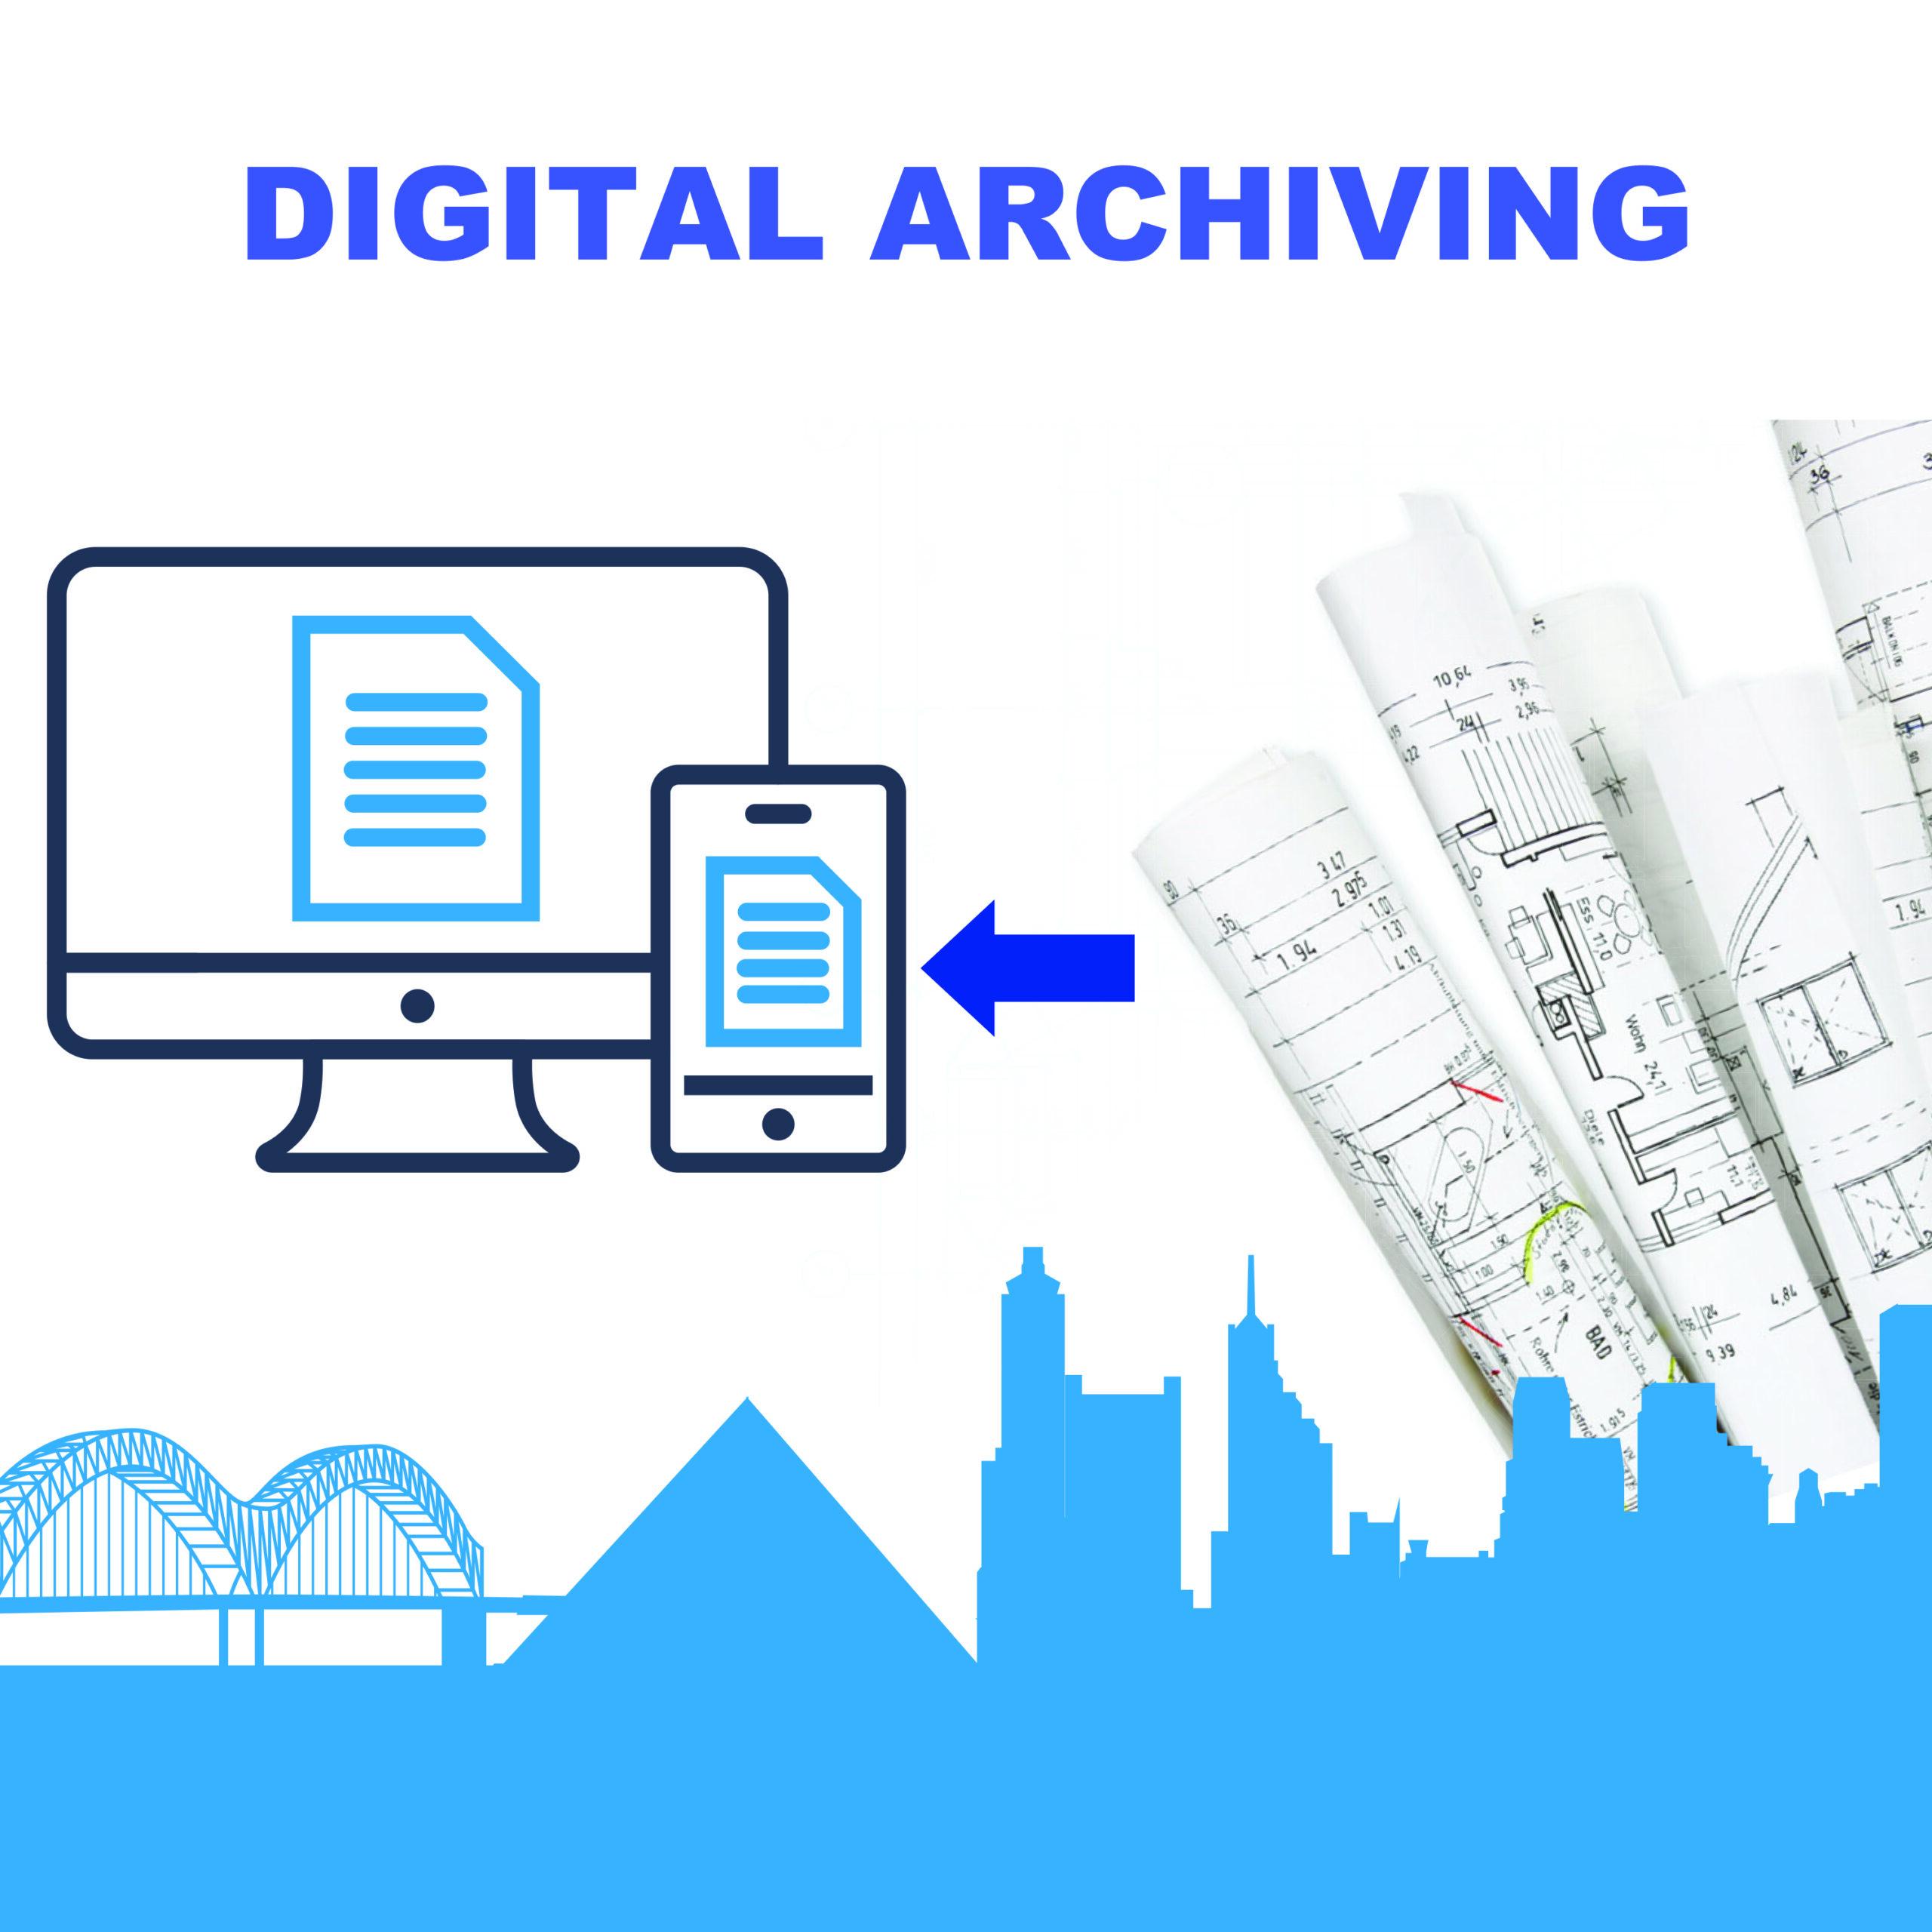 Digital Archiving